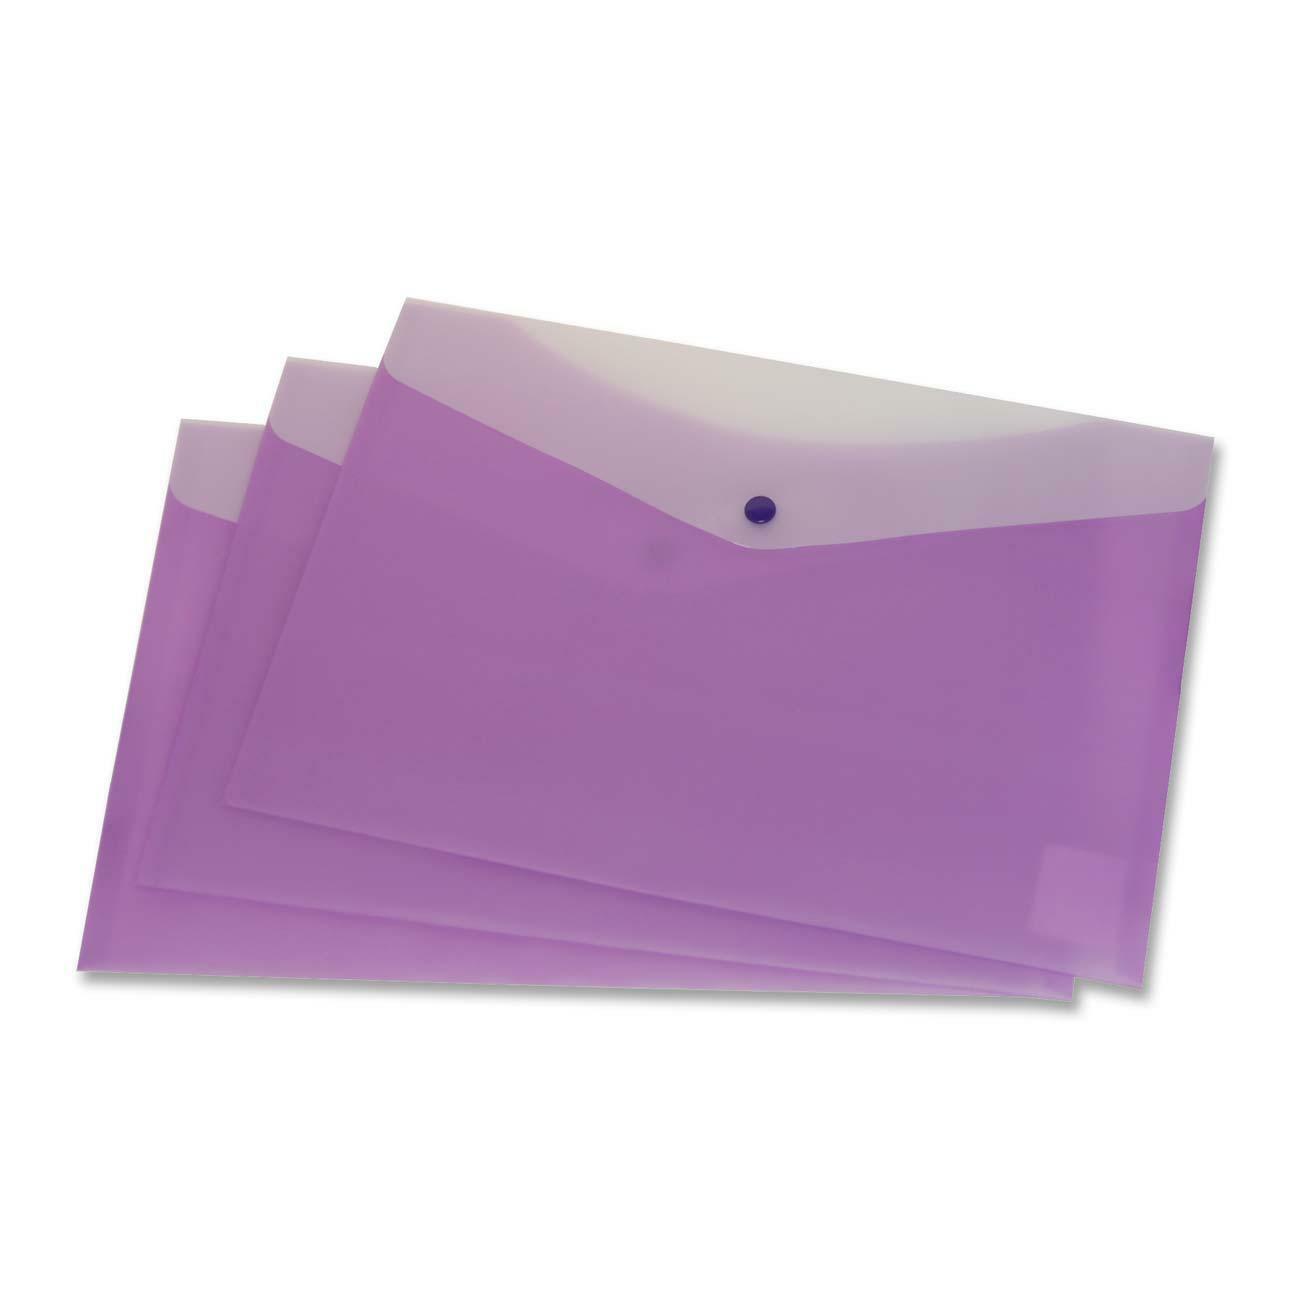 power surge technologies ltd office supplies envelopes